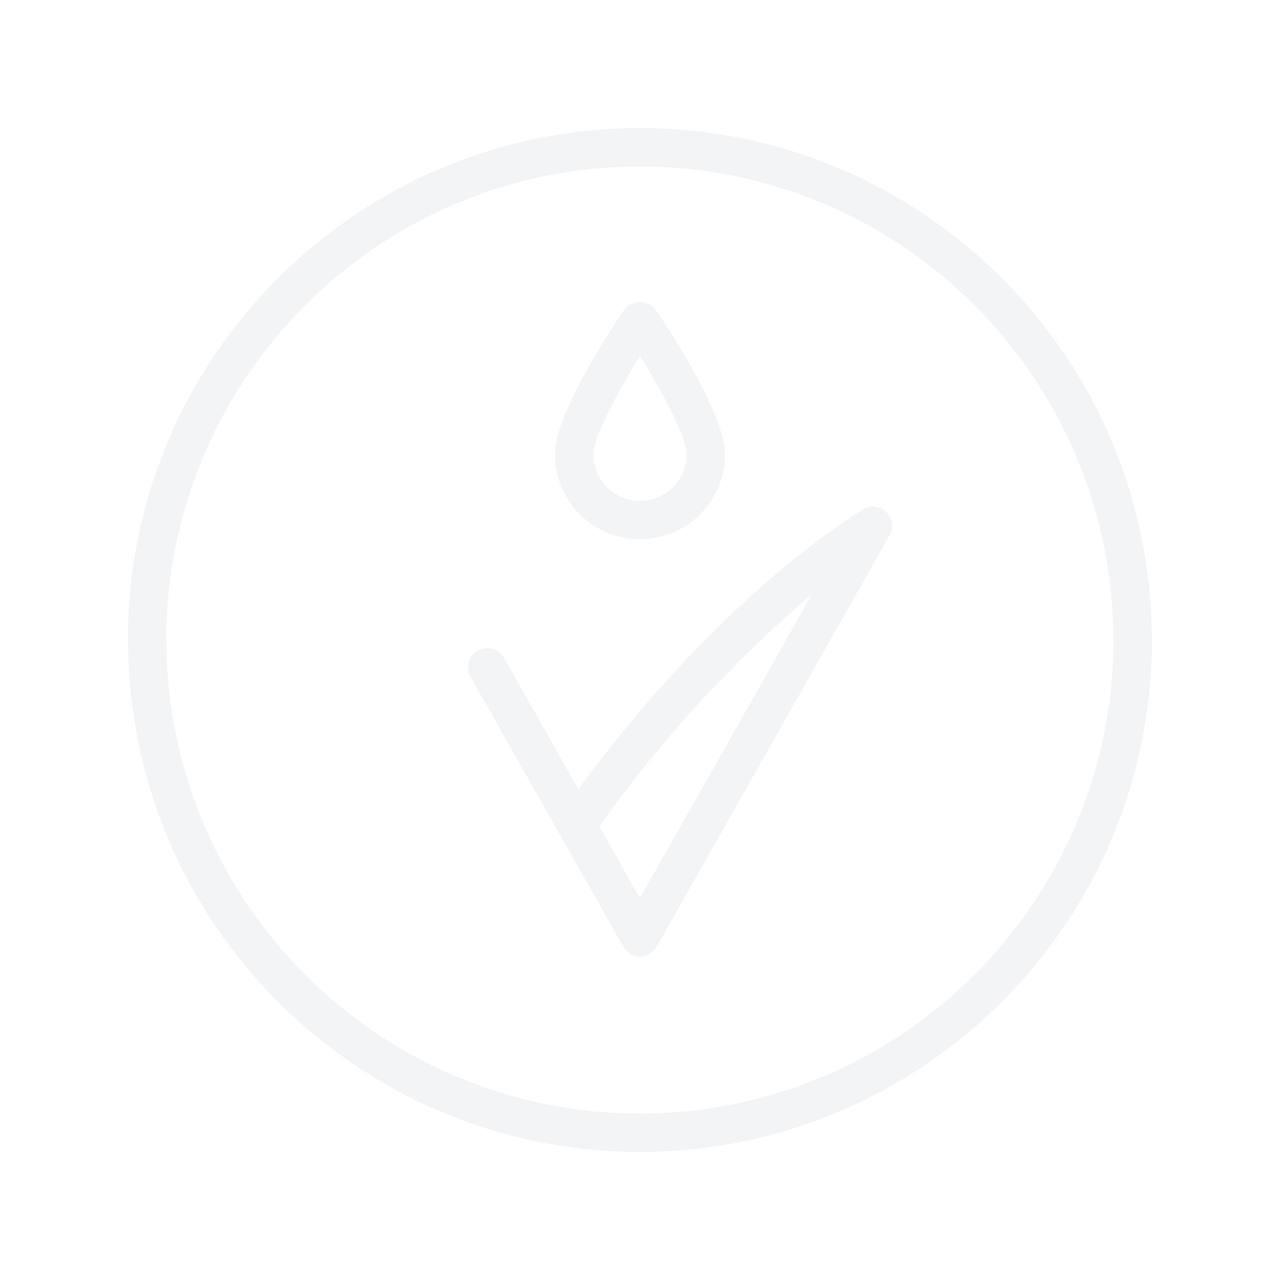 HOLIKA HOLIKA Aloe Soothing Essence Emulsion 200ml увлажняющая эмульсия с алоэ